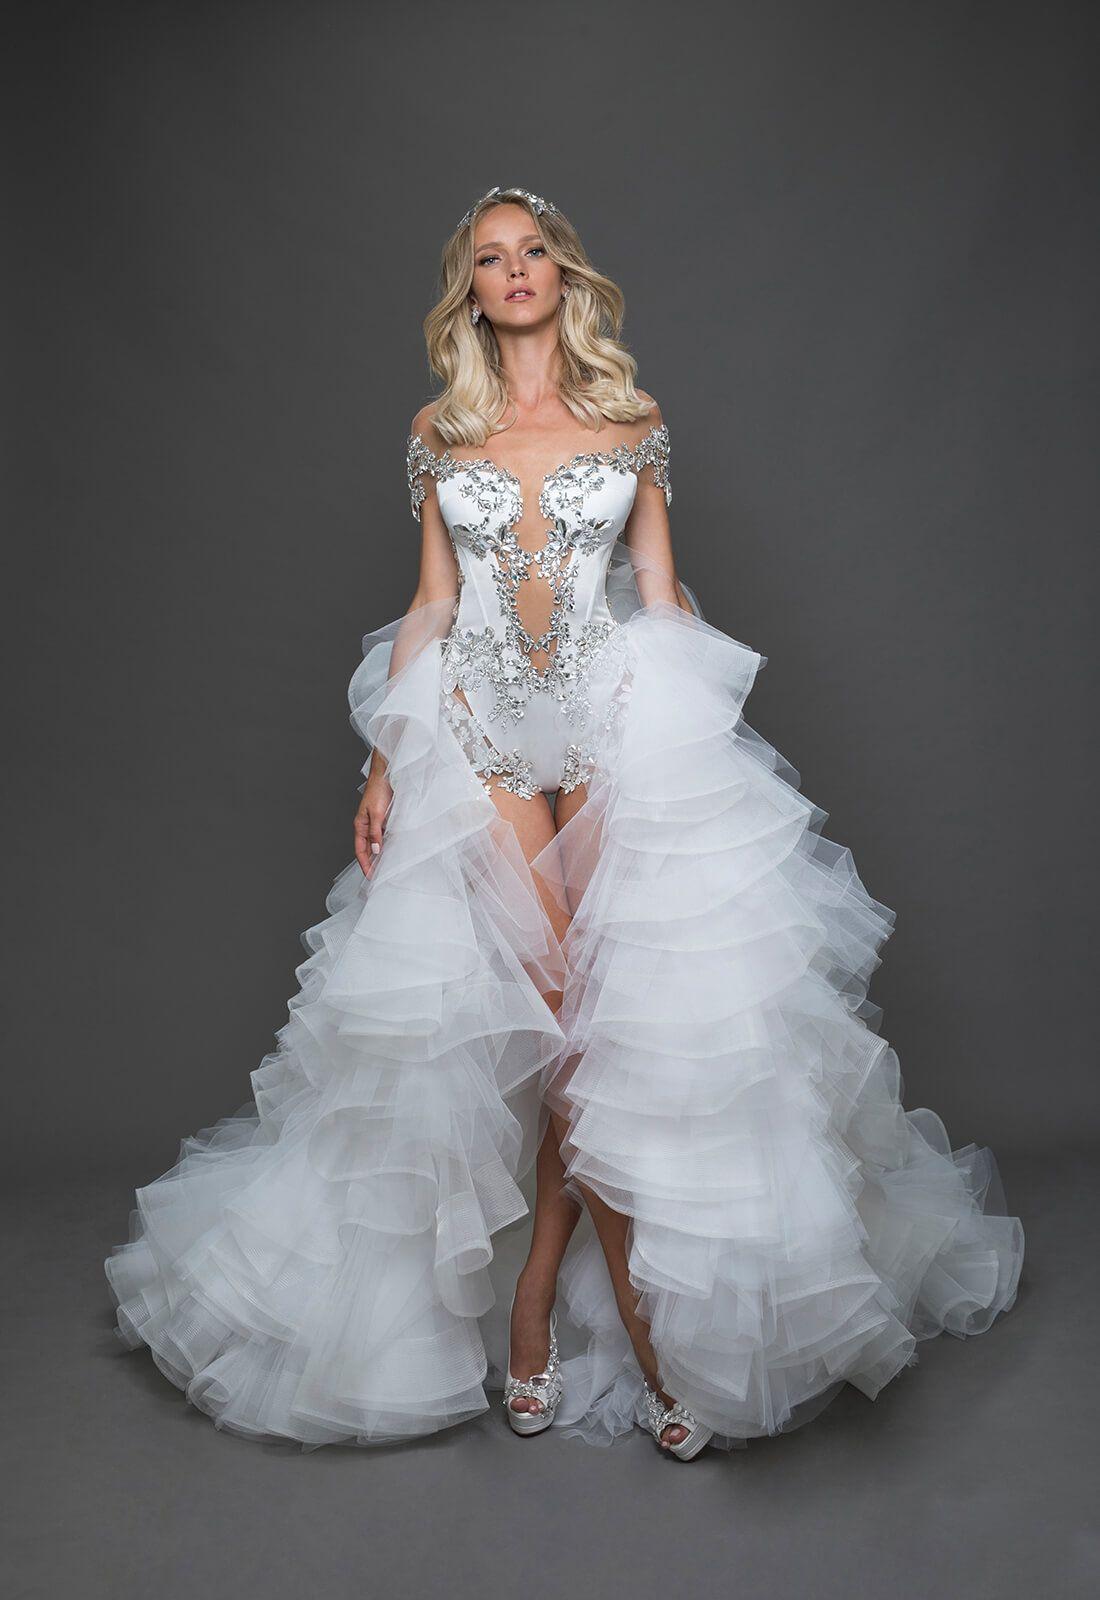 Wedding Gown Pnina Tornai 2018 Style No 4625 Pnina Tornai Wedding Dress Wedding Dresses Wedding Dresses Lace